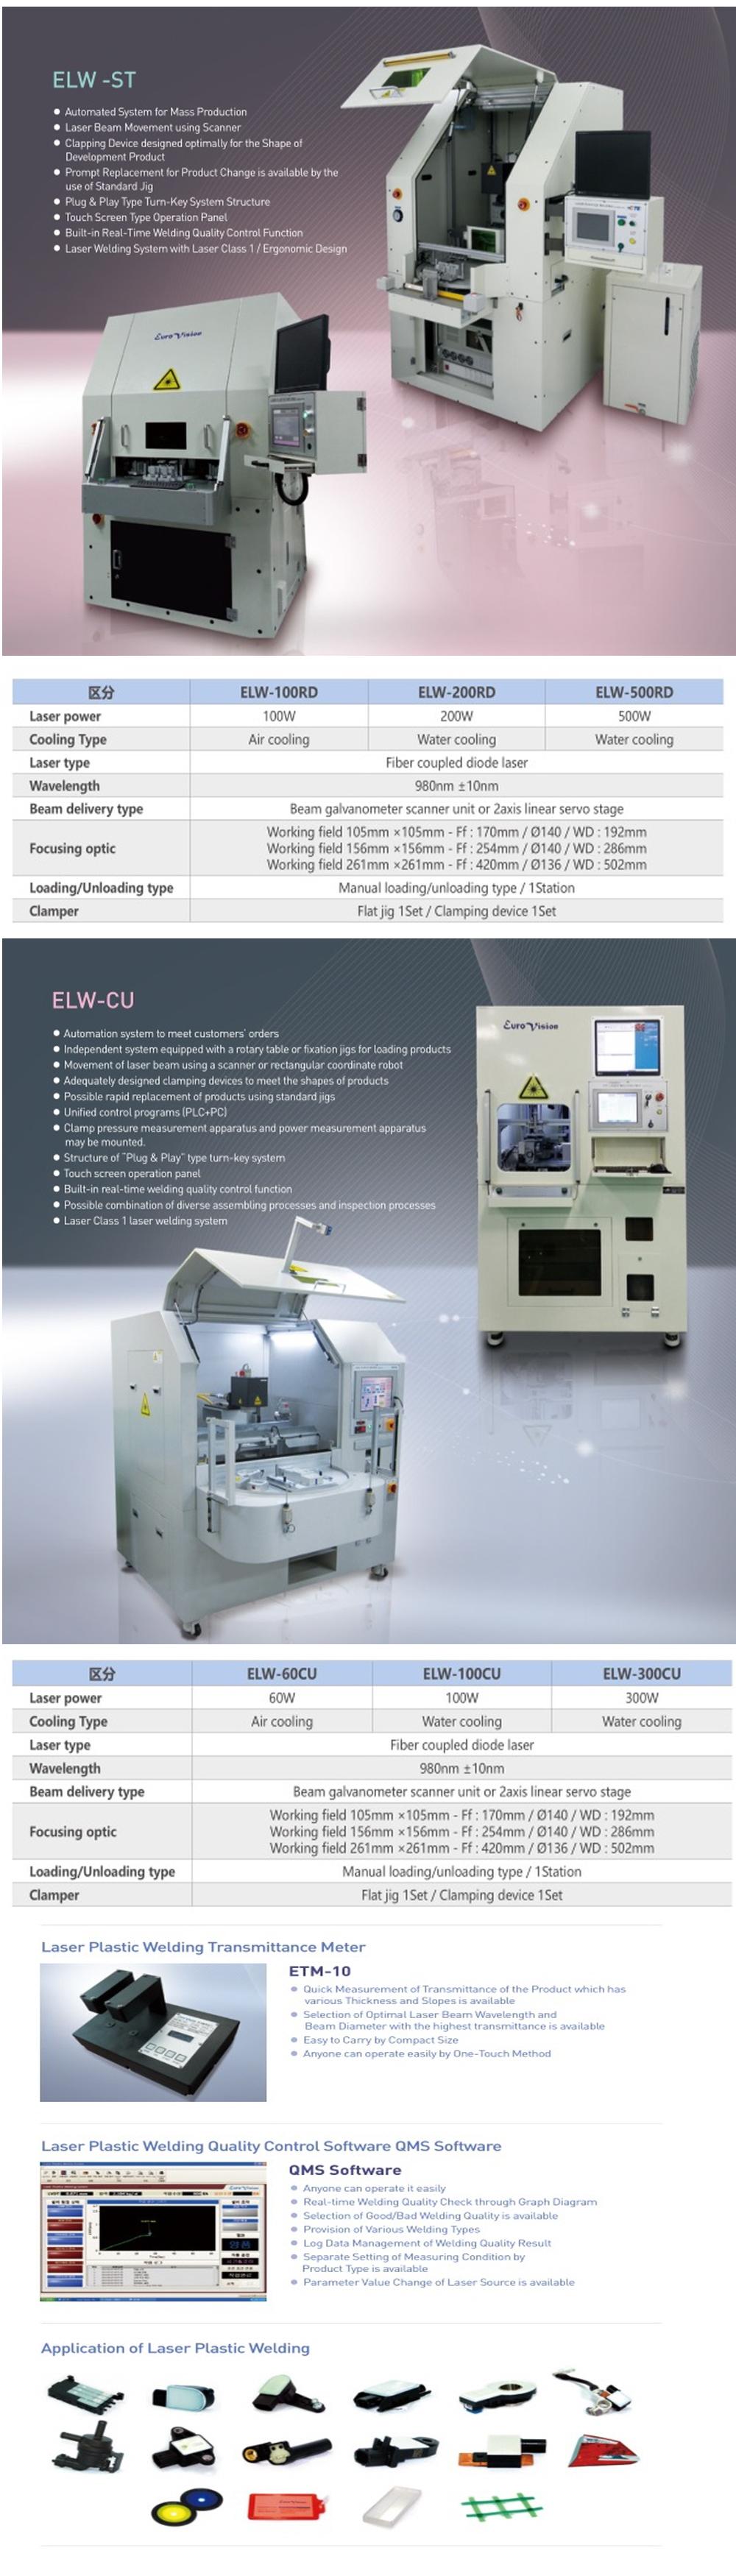 Euro Vision Laser Laser Plastic Welding M/C ELW-Series